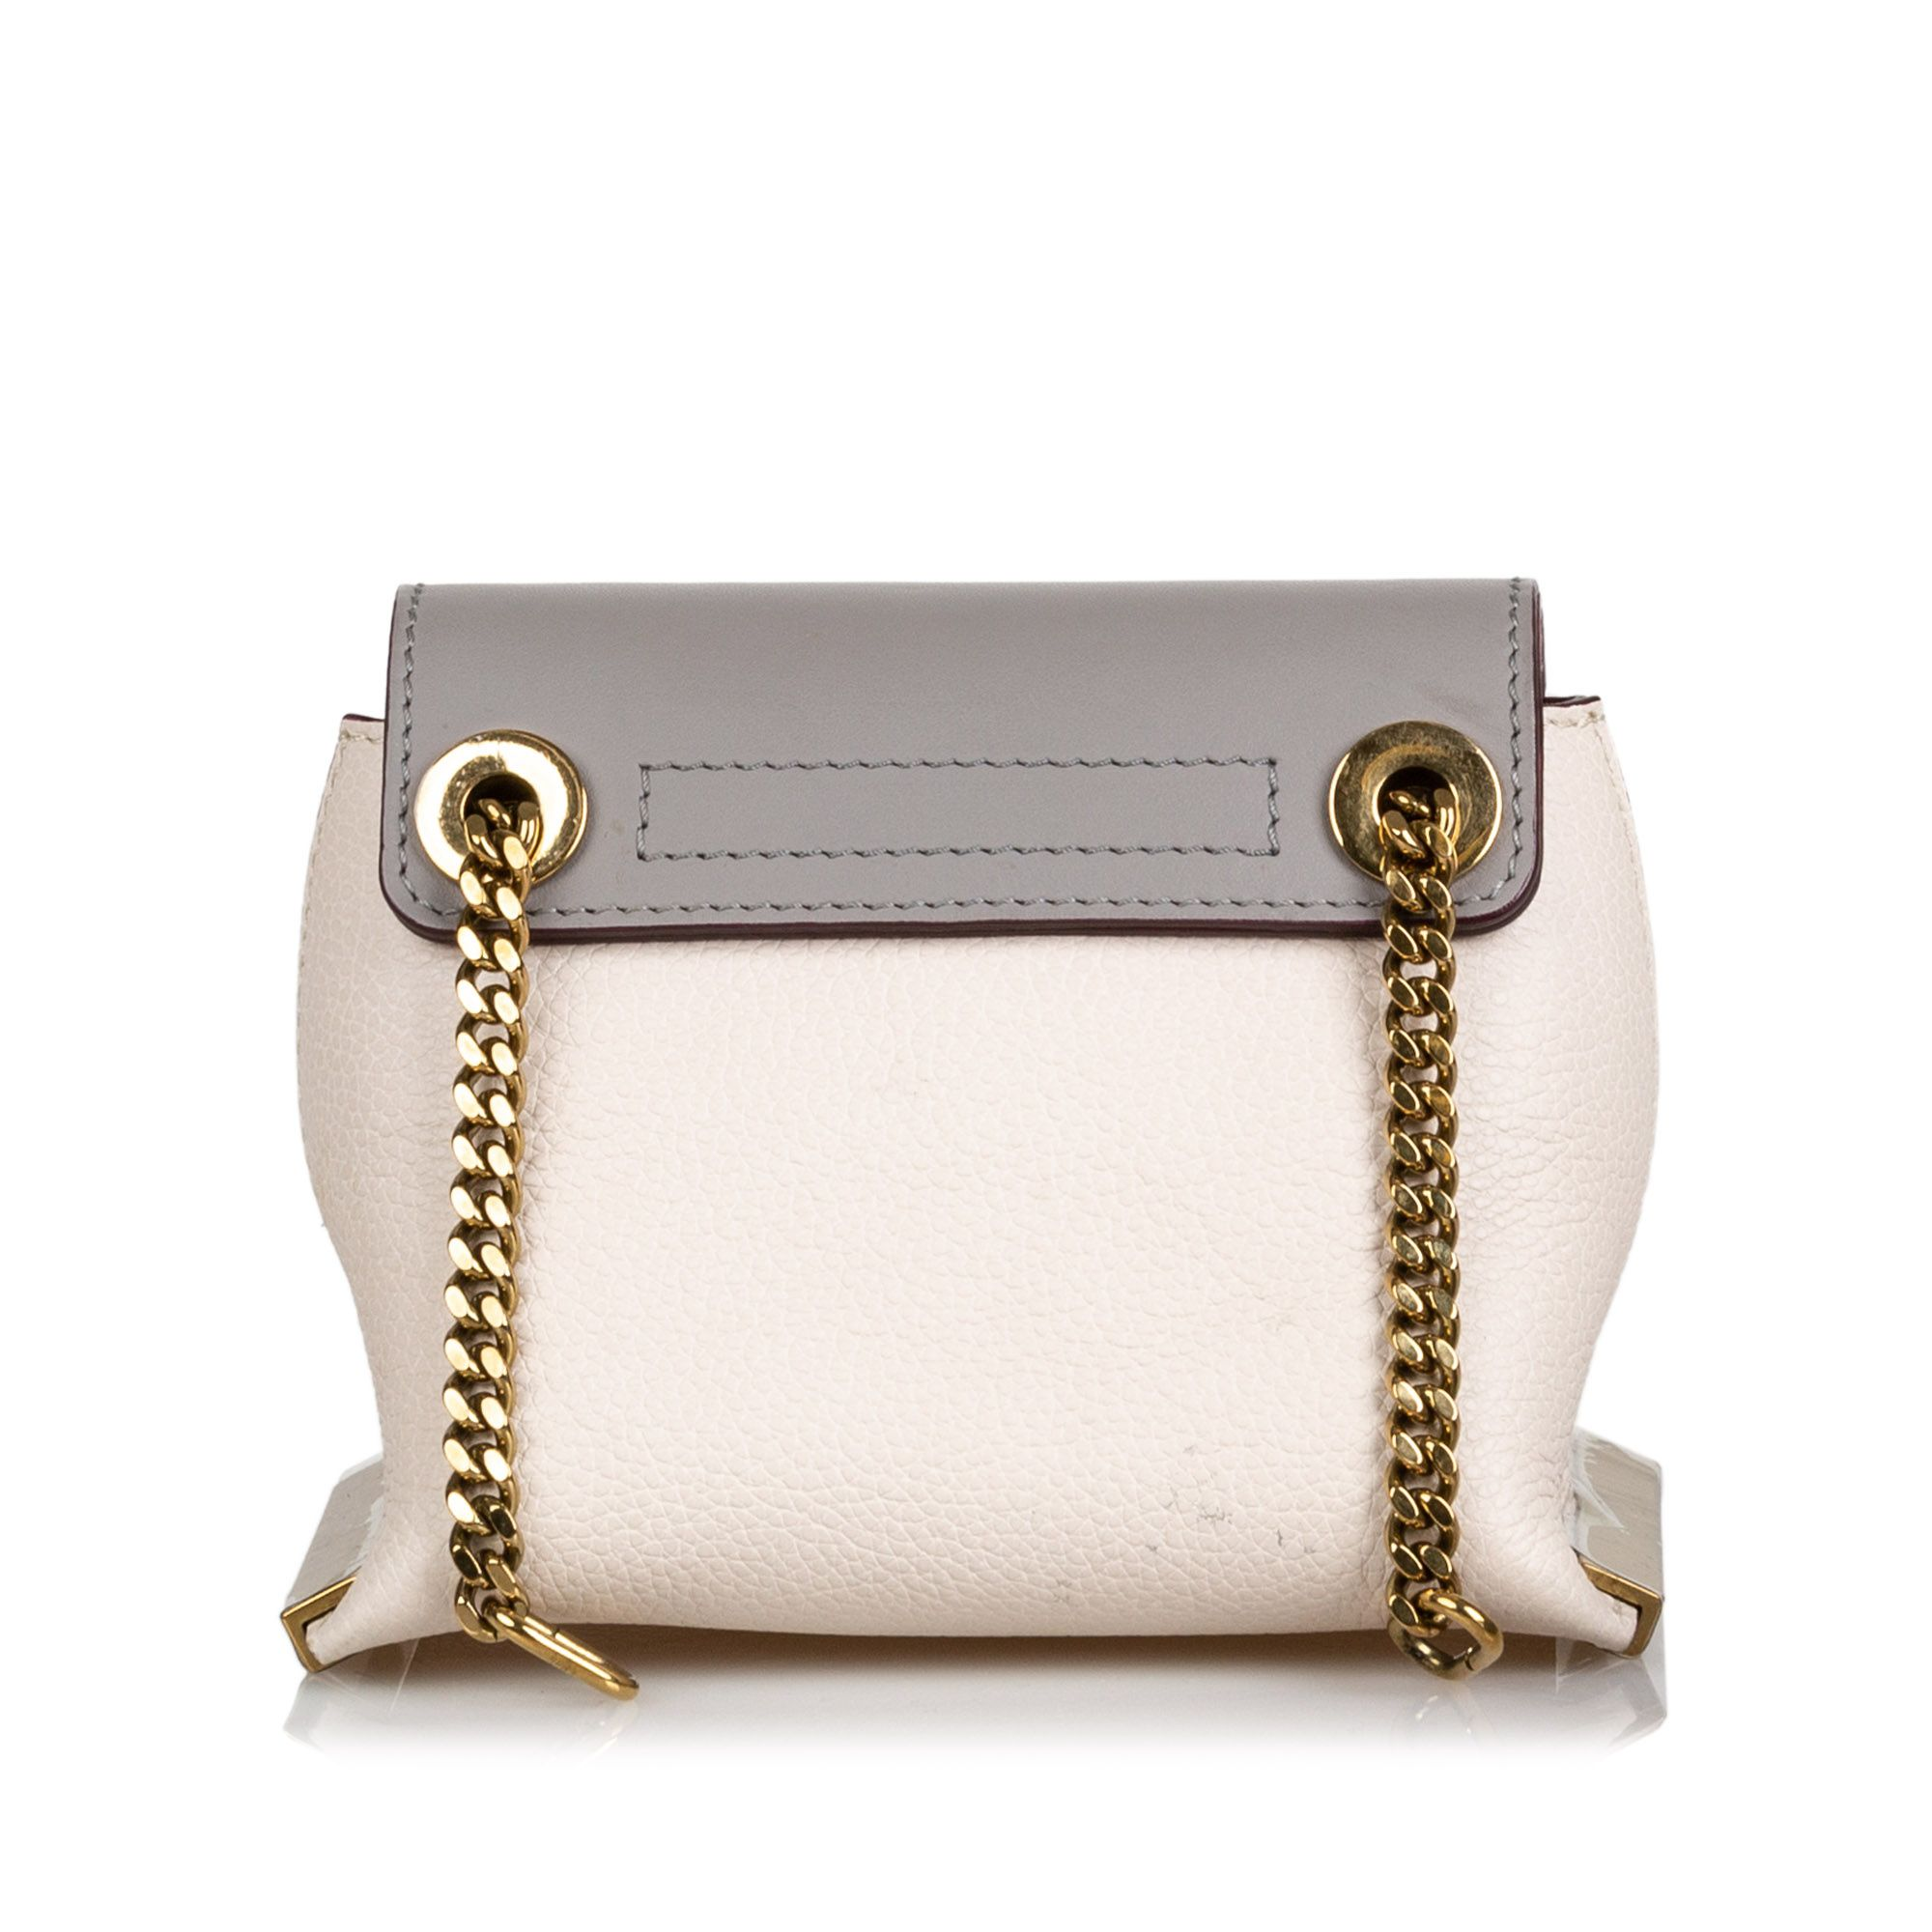 Vintage Chloe Leather Mini Clare Crossbody White